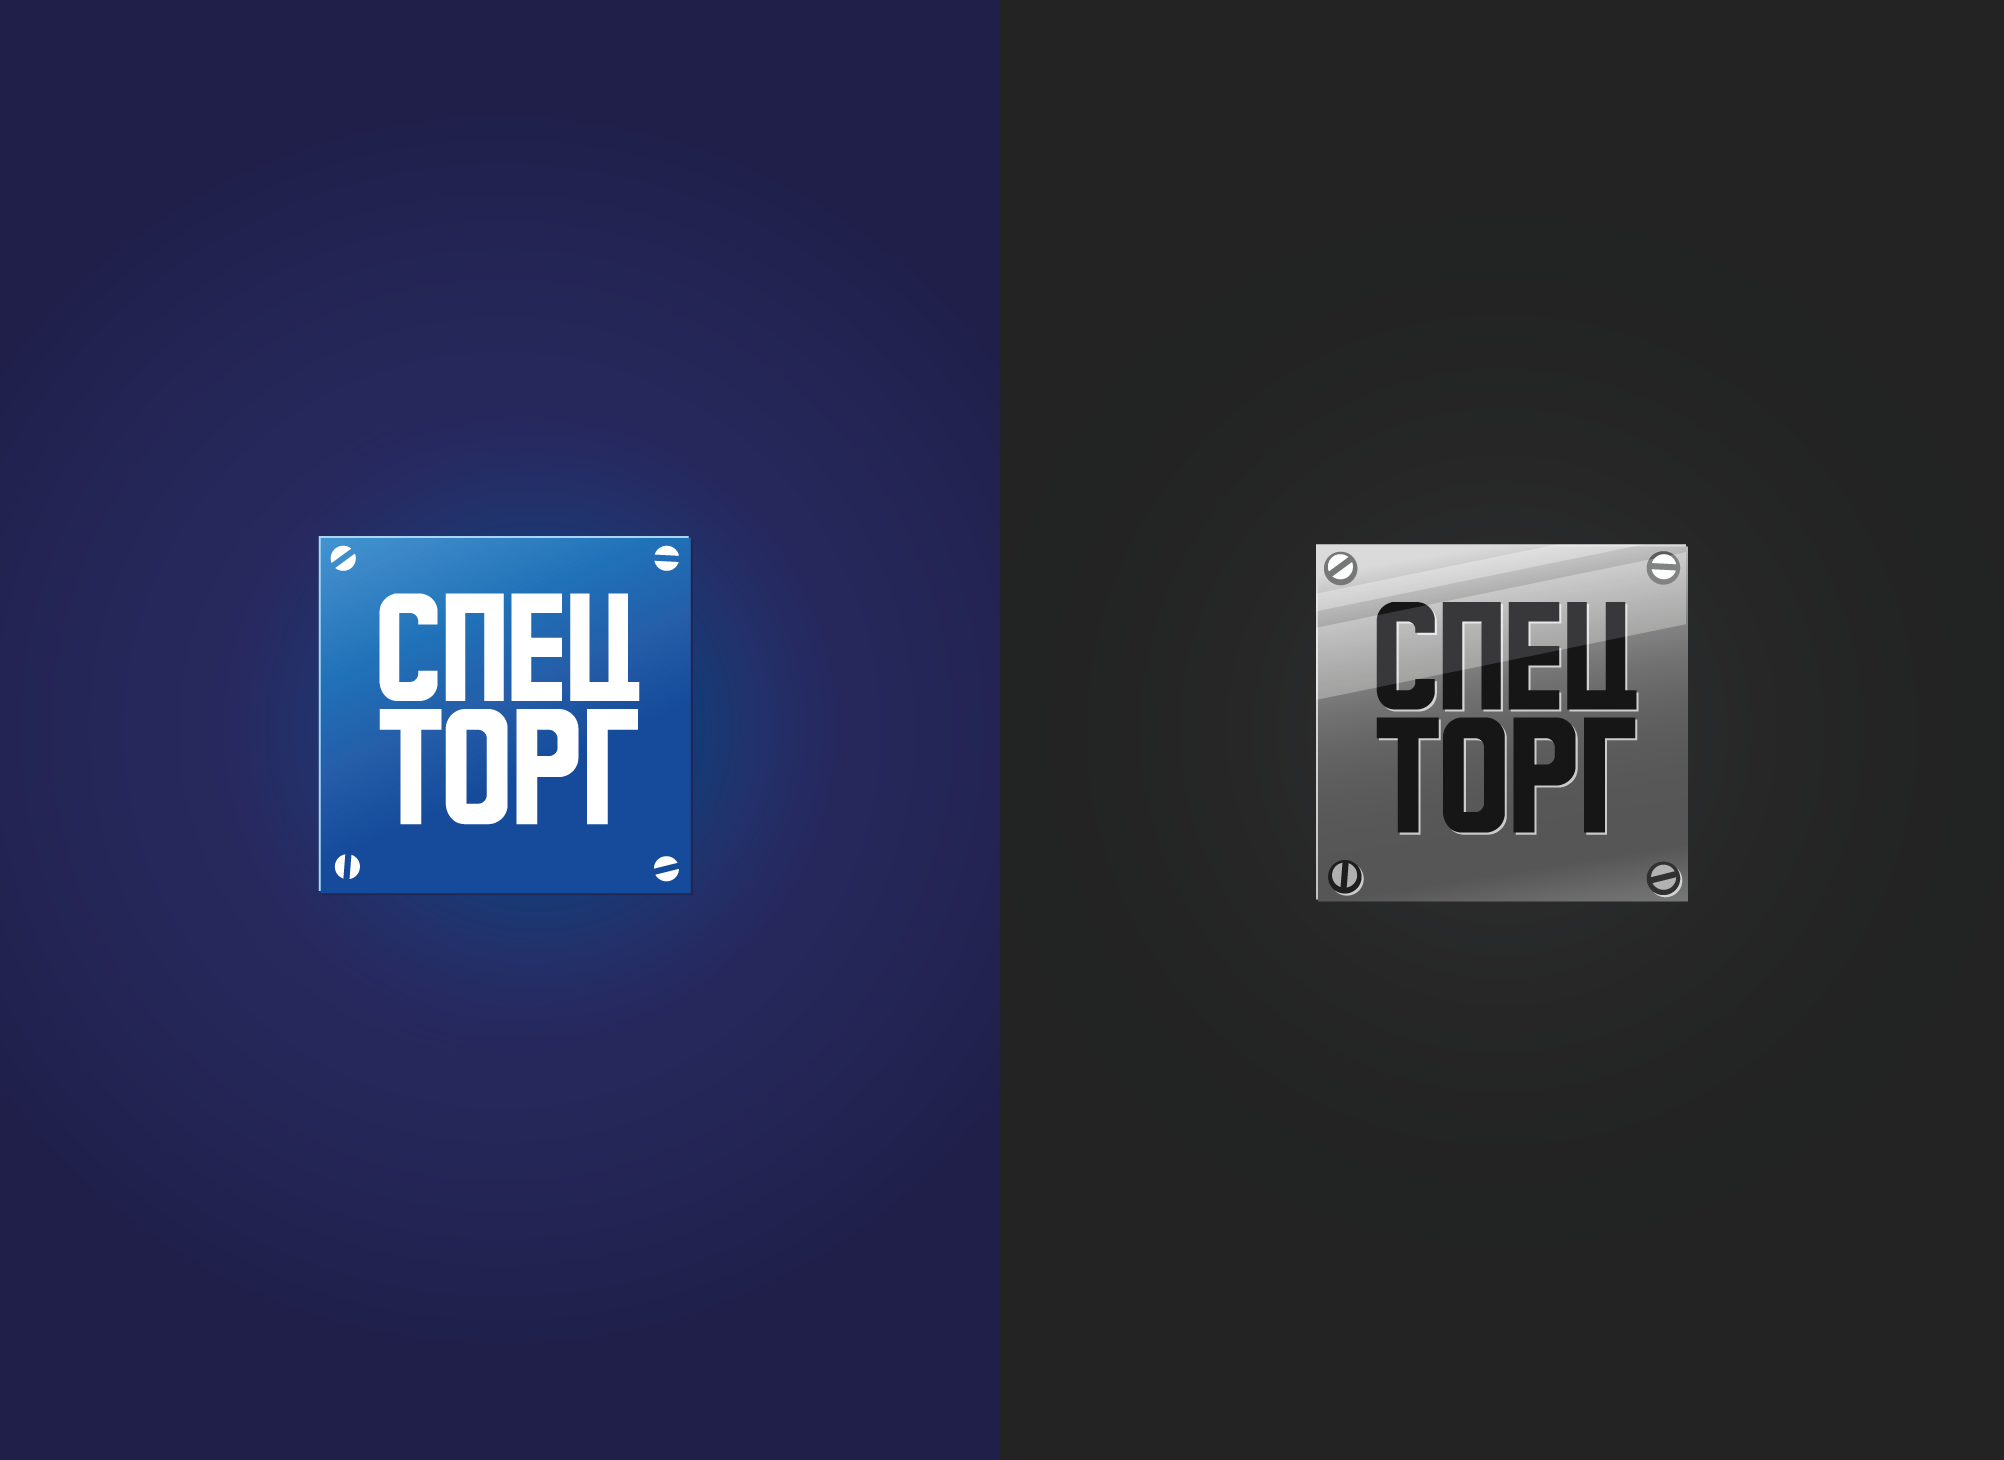 Разработать дизайн  логотипа компании фото f_3215dc4450d32088.png